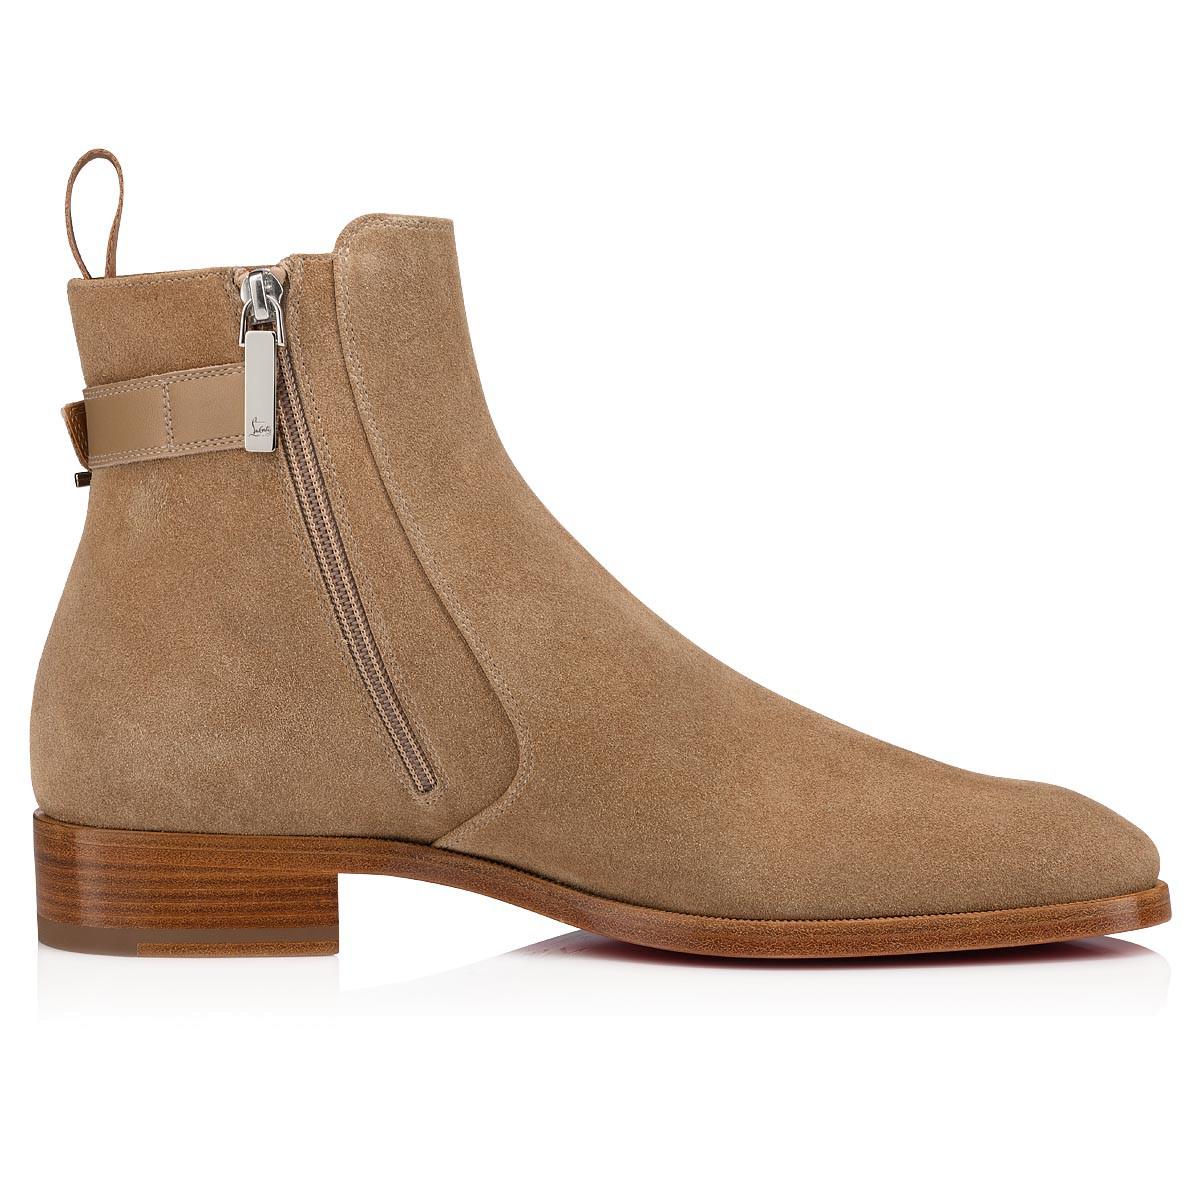 Shoes - Valido Flat - Christian Louboutin